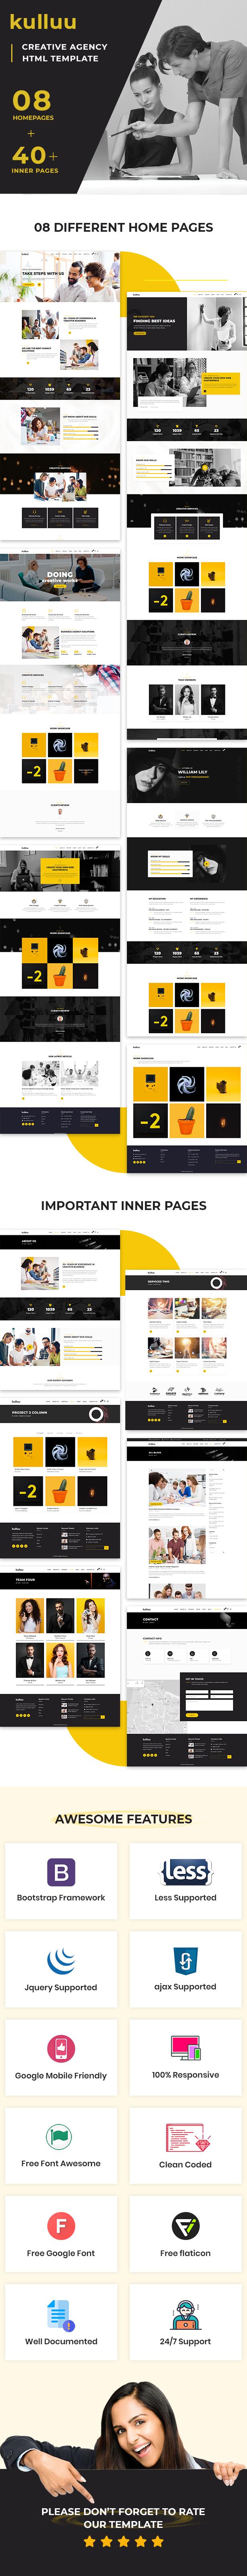 Kulluu - Creative Agency Responsive HTML Template